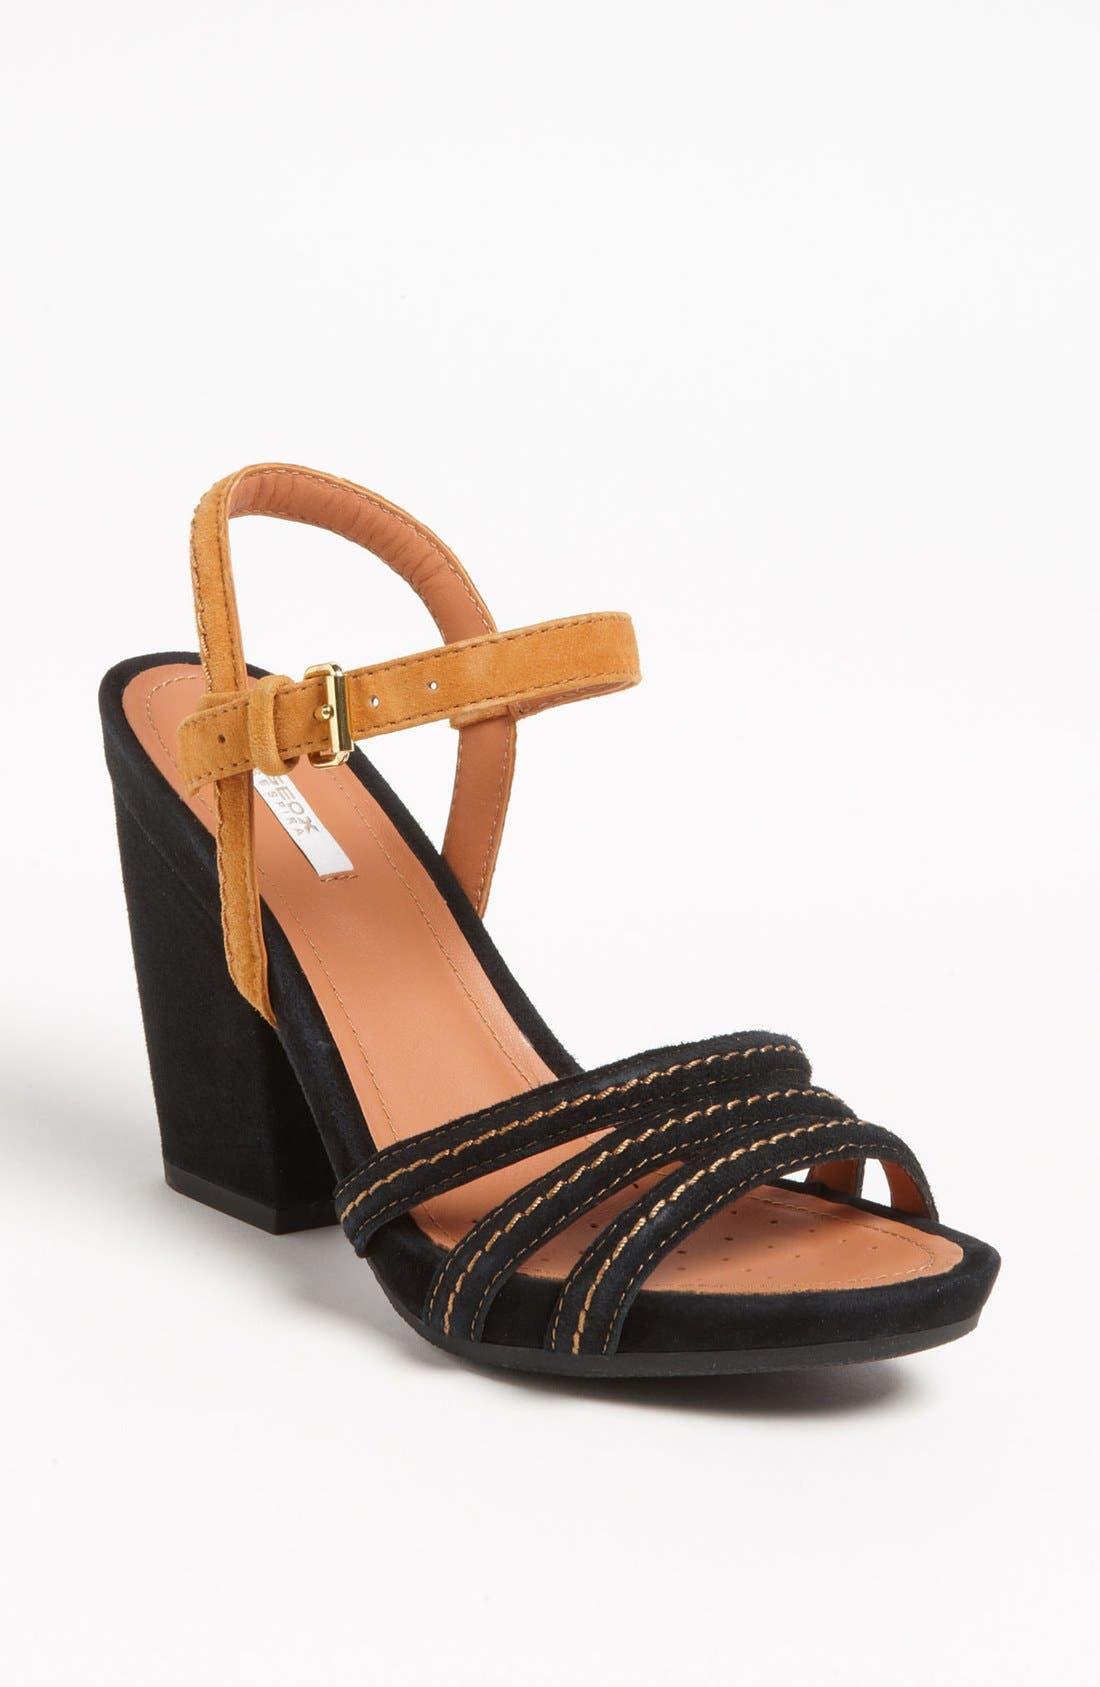 Main Image - Geox 'Divinity' Sandal